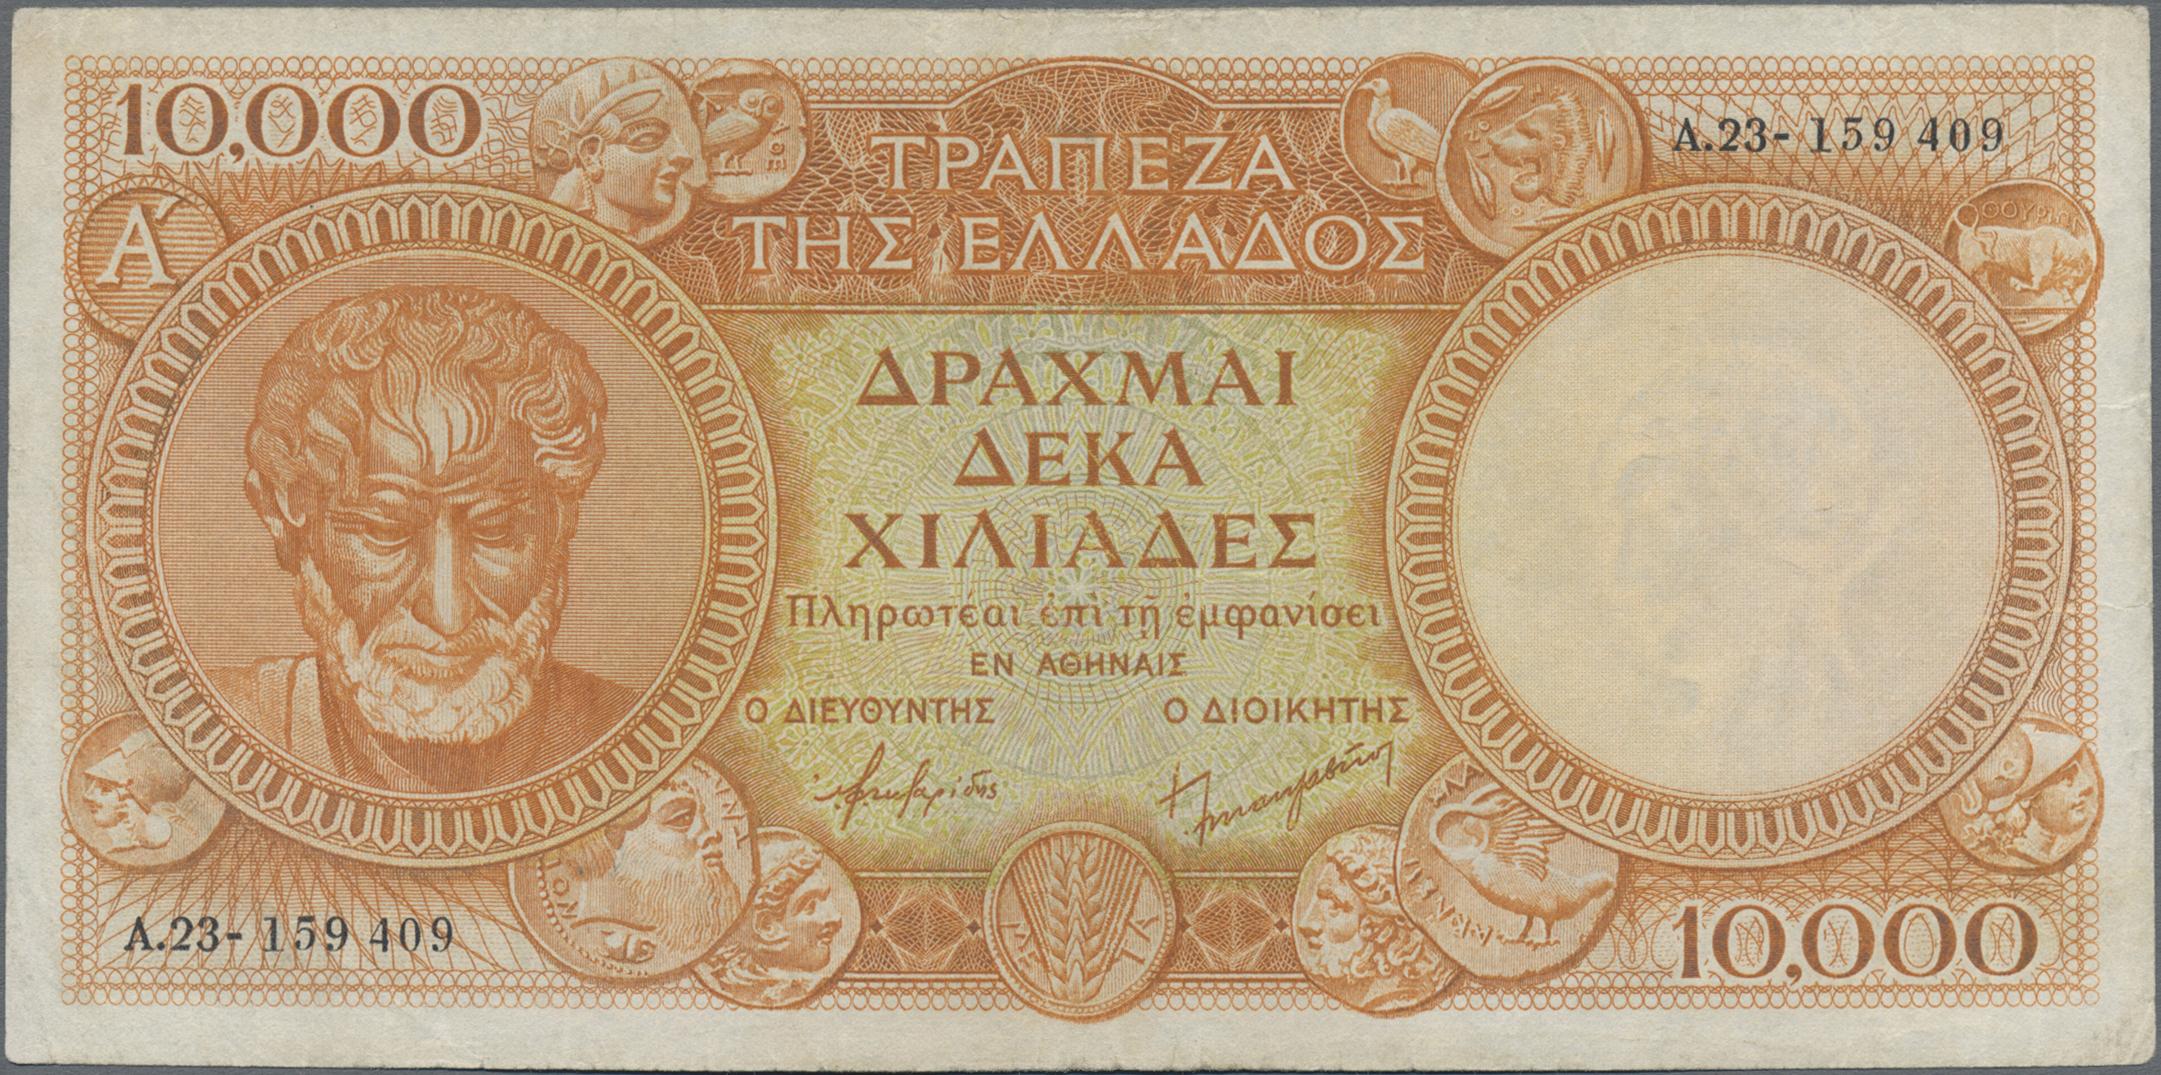 Lot 00366 - Greece / Griechenland   Banknoten  -  Auktionshaus Christoph Gärtner GmbH & Co. KG Sale #48 The Banknotes